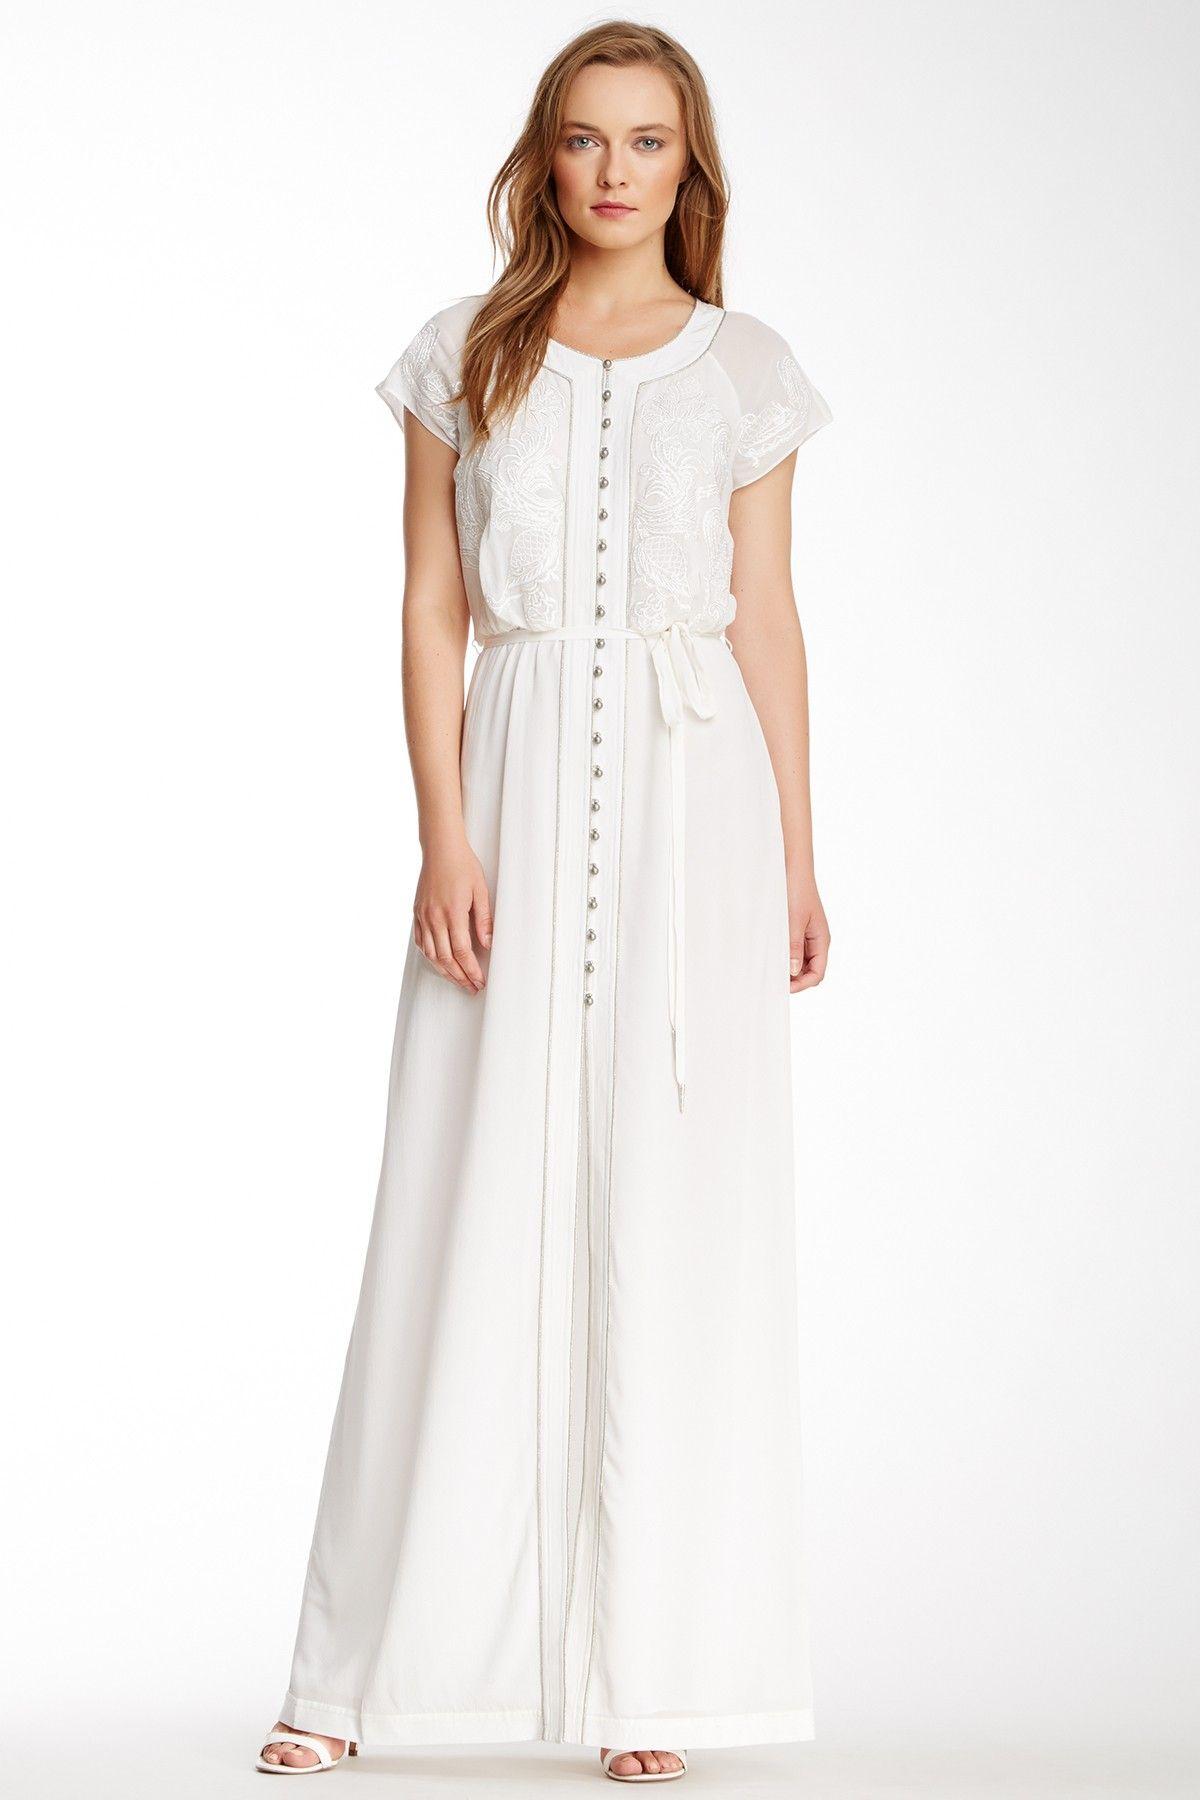 Embroidered maxi dress fashion pinterest marchesa maxi